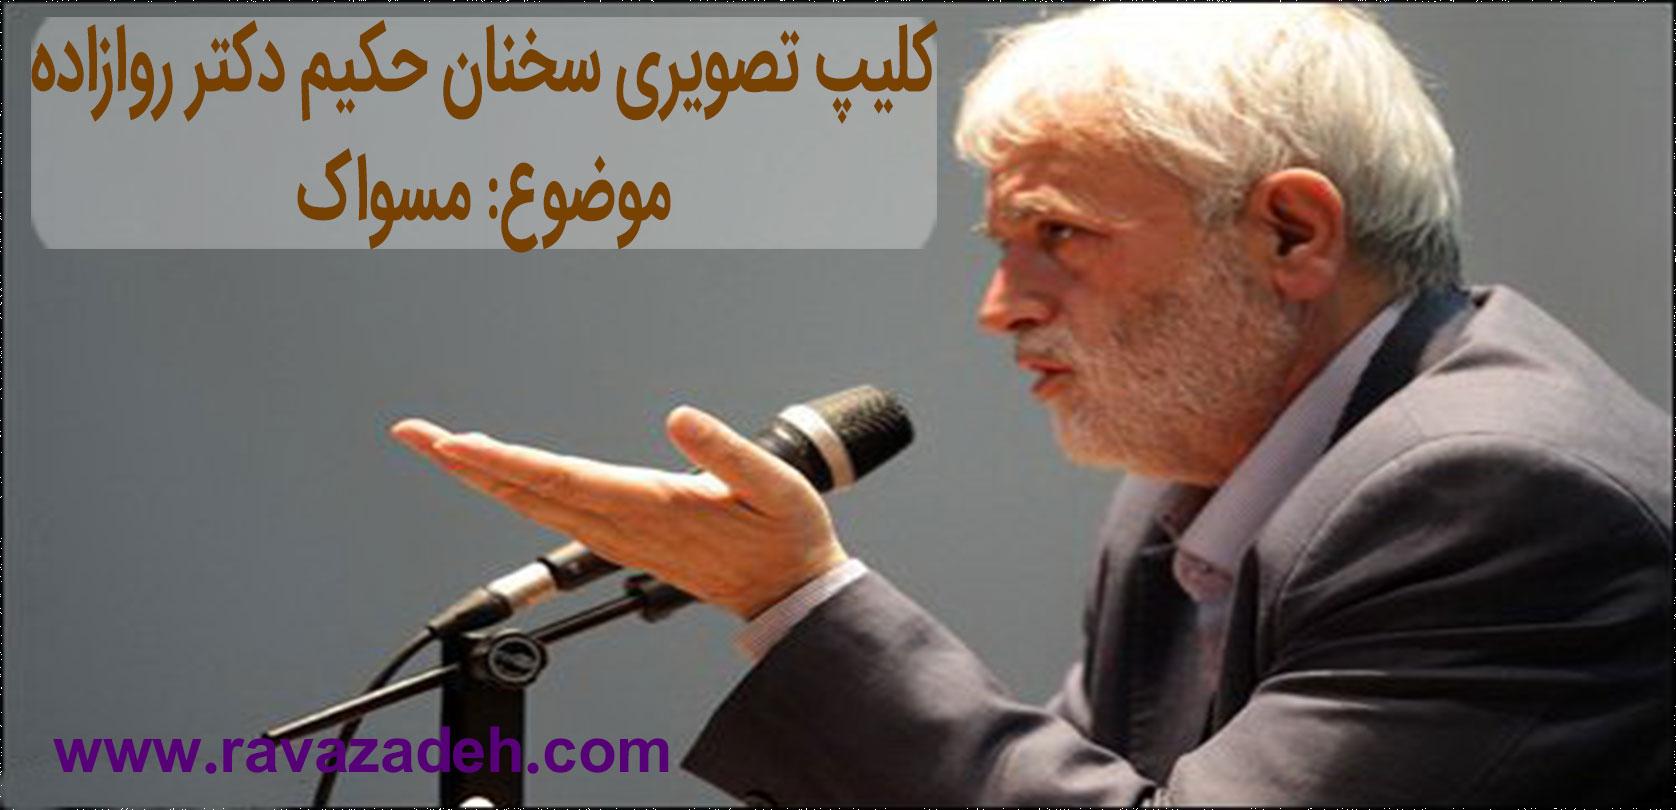 Photo of مسواک + کلیپ تصویری سخنرانی حکیم دکتر روازاده